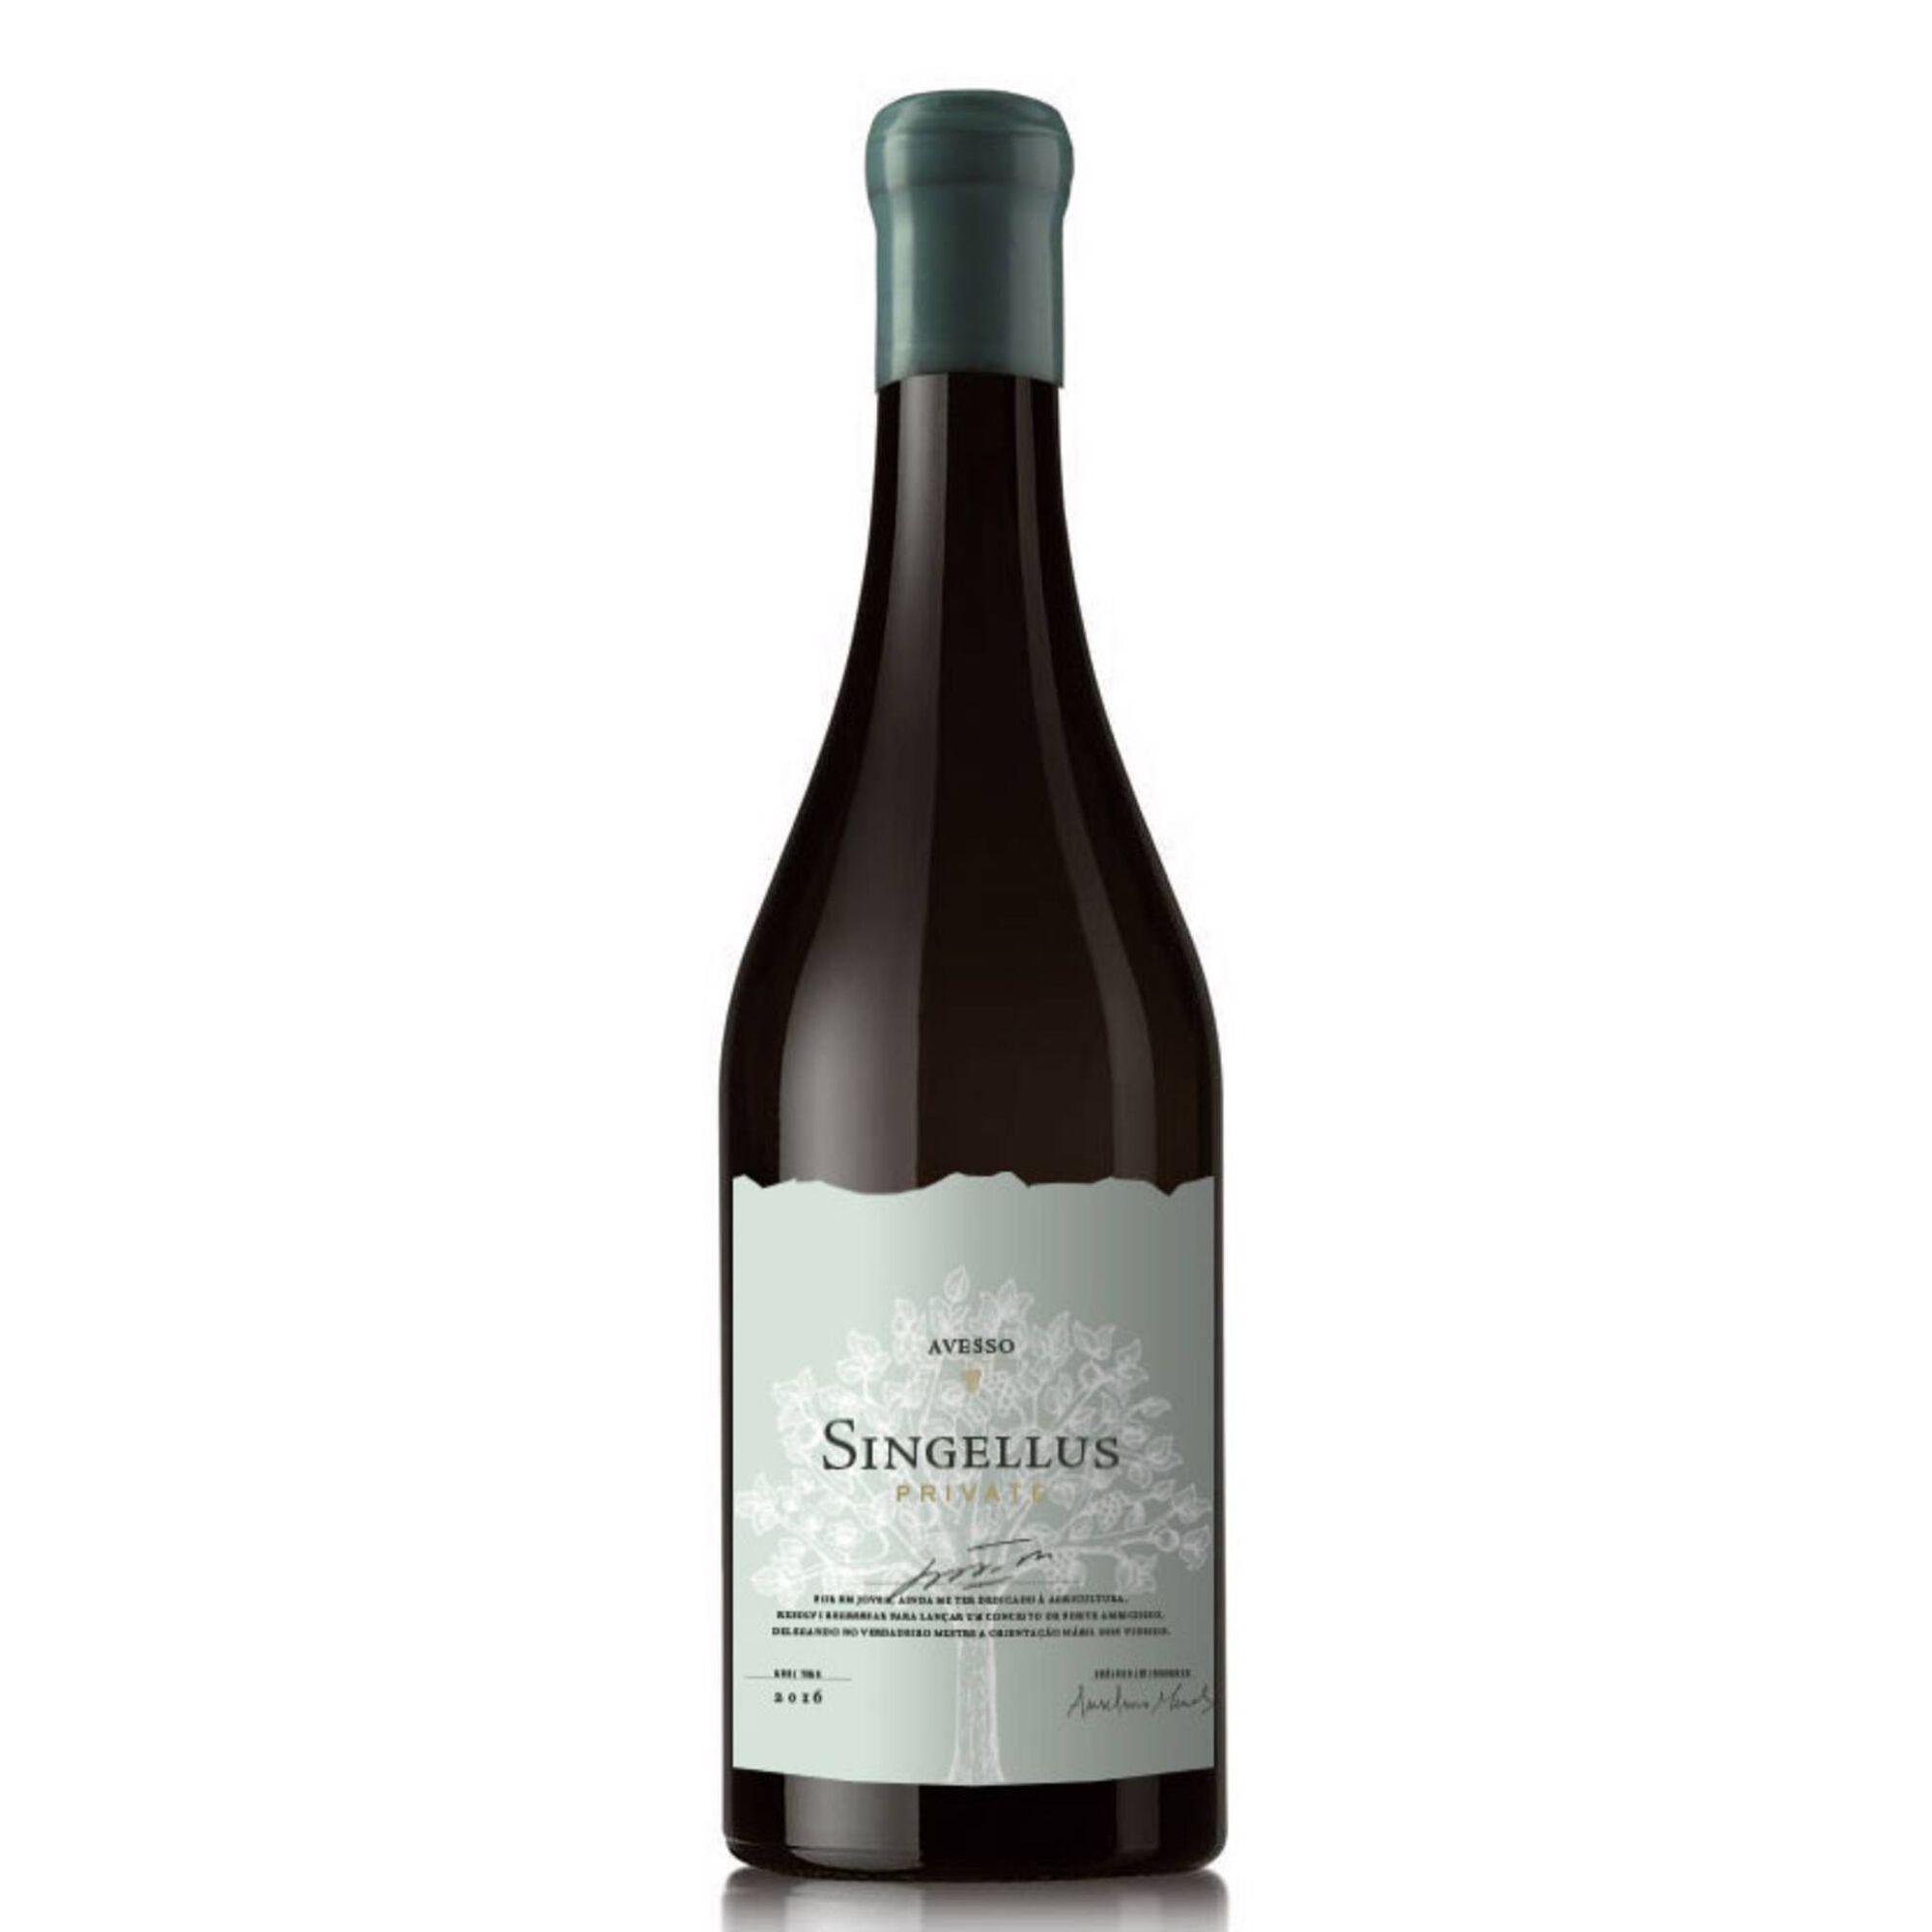 Singellus Private Avesso DOC Vinho Verde Branco